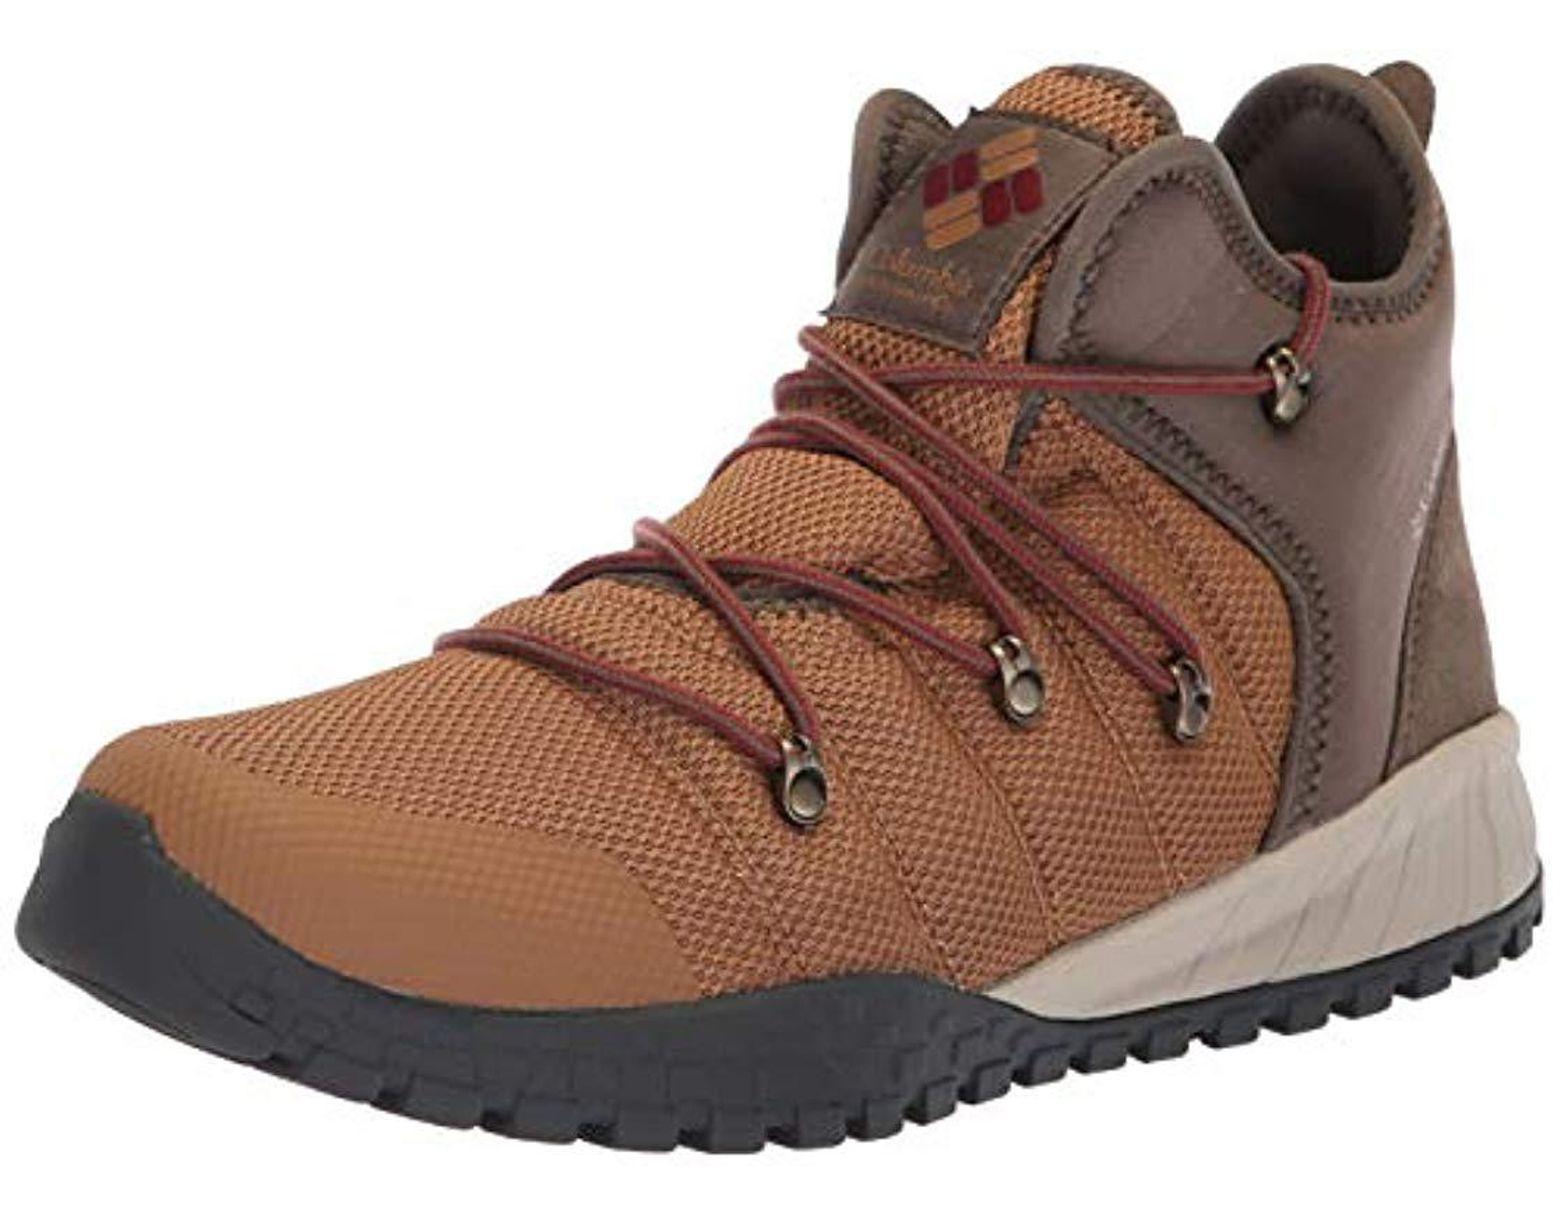 86f9e5d8760 Men's Fairbanks 503 Fashion Boot